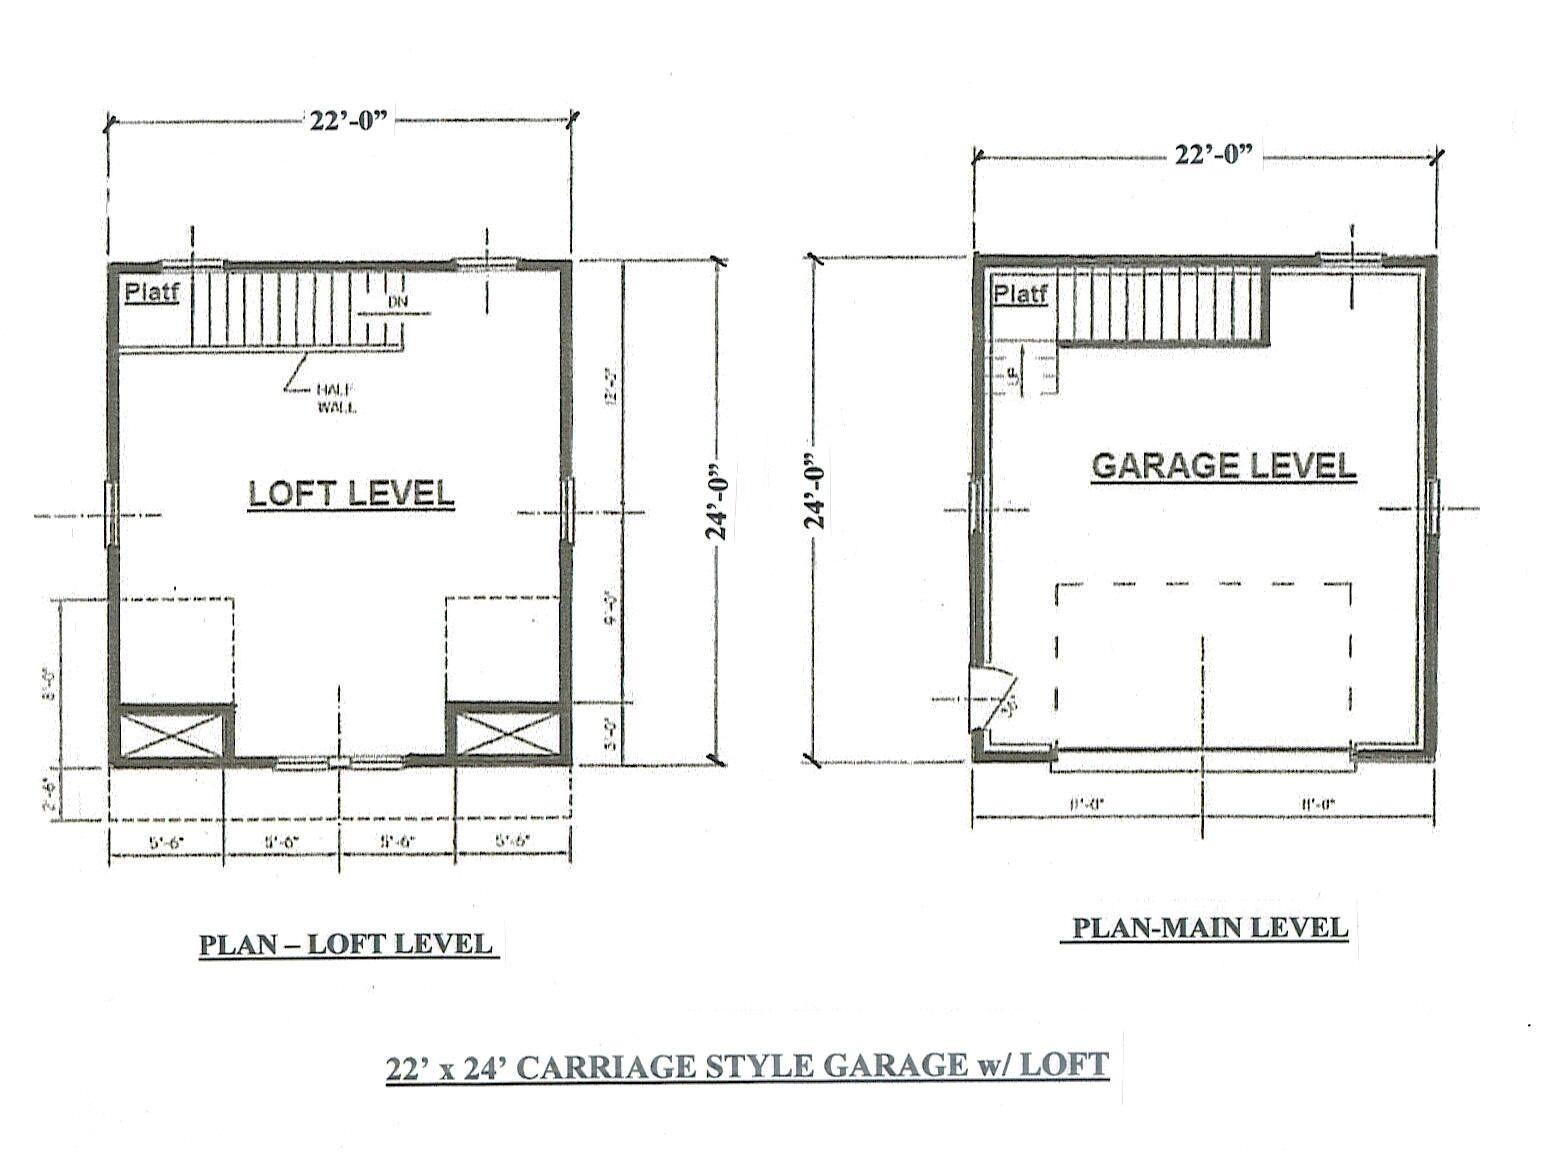 22x24 2 car carriage garage building blueprint plans for Garage construction plans free